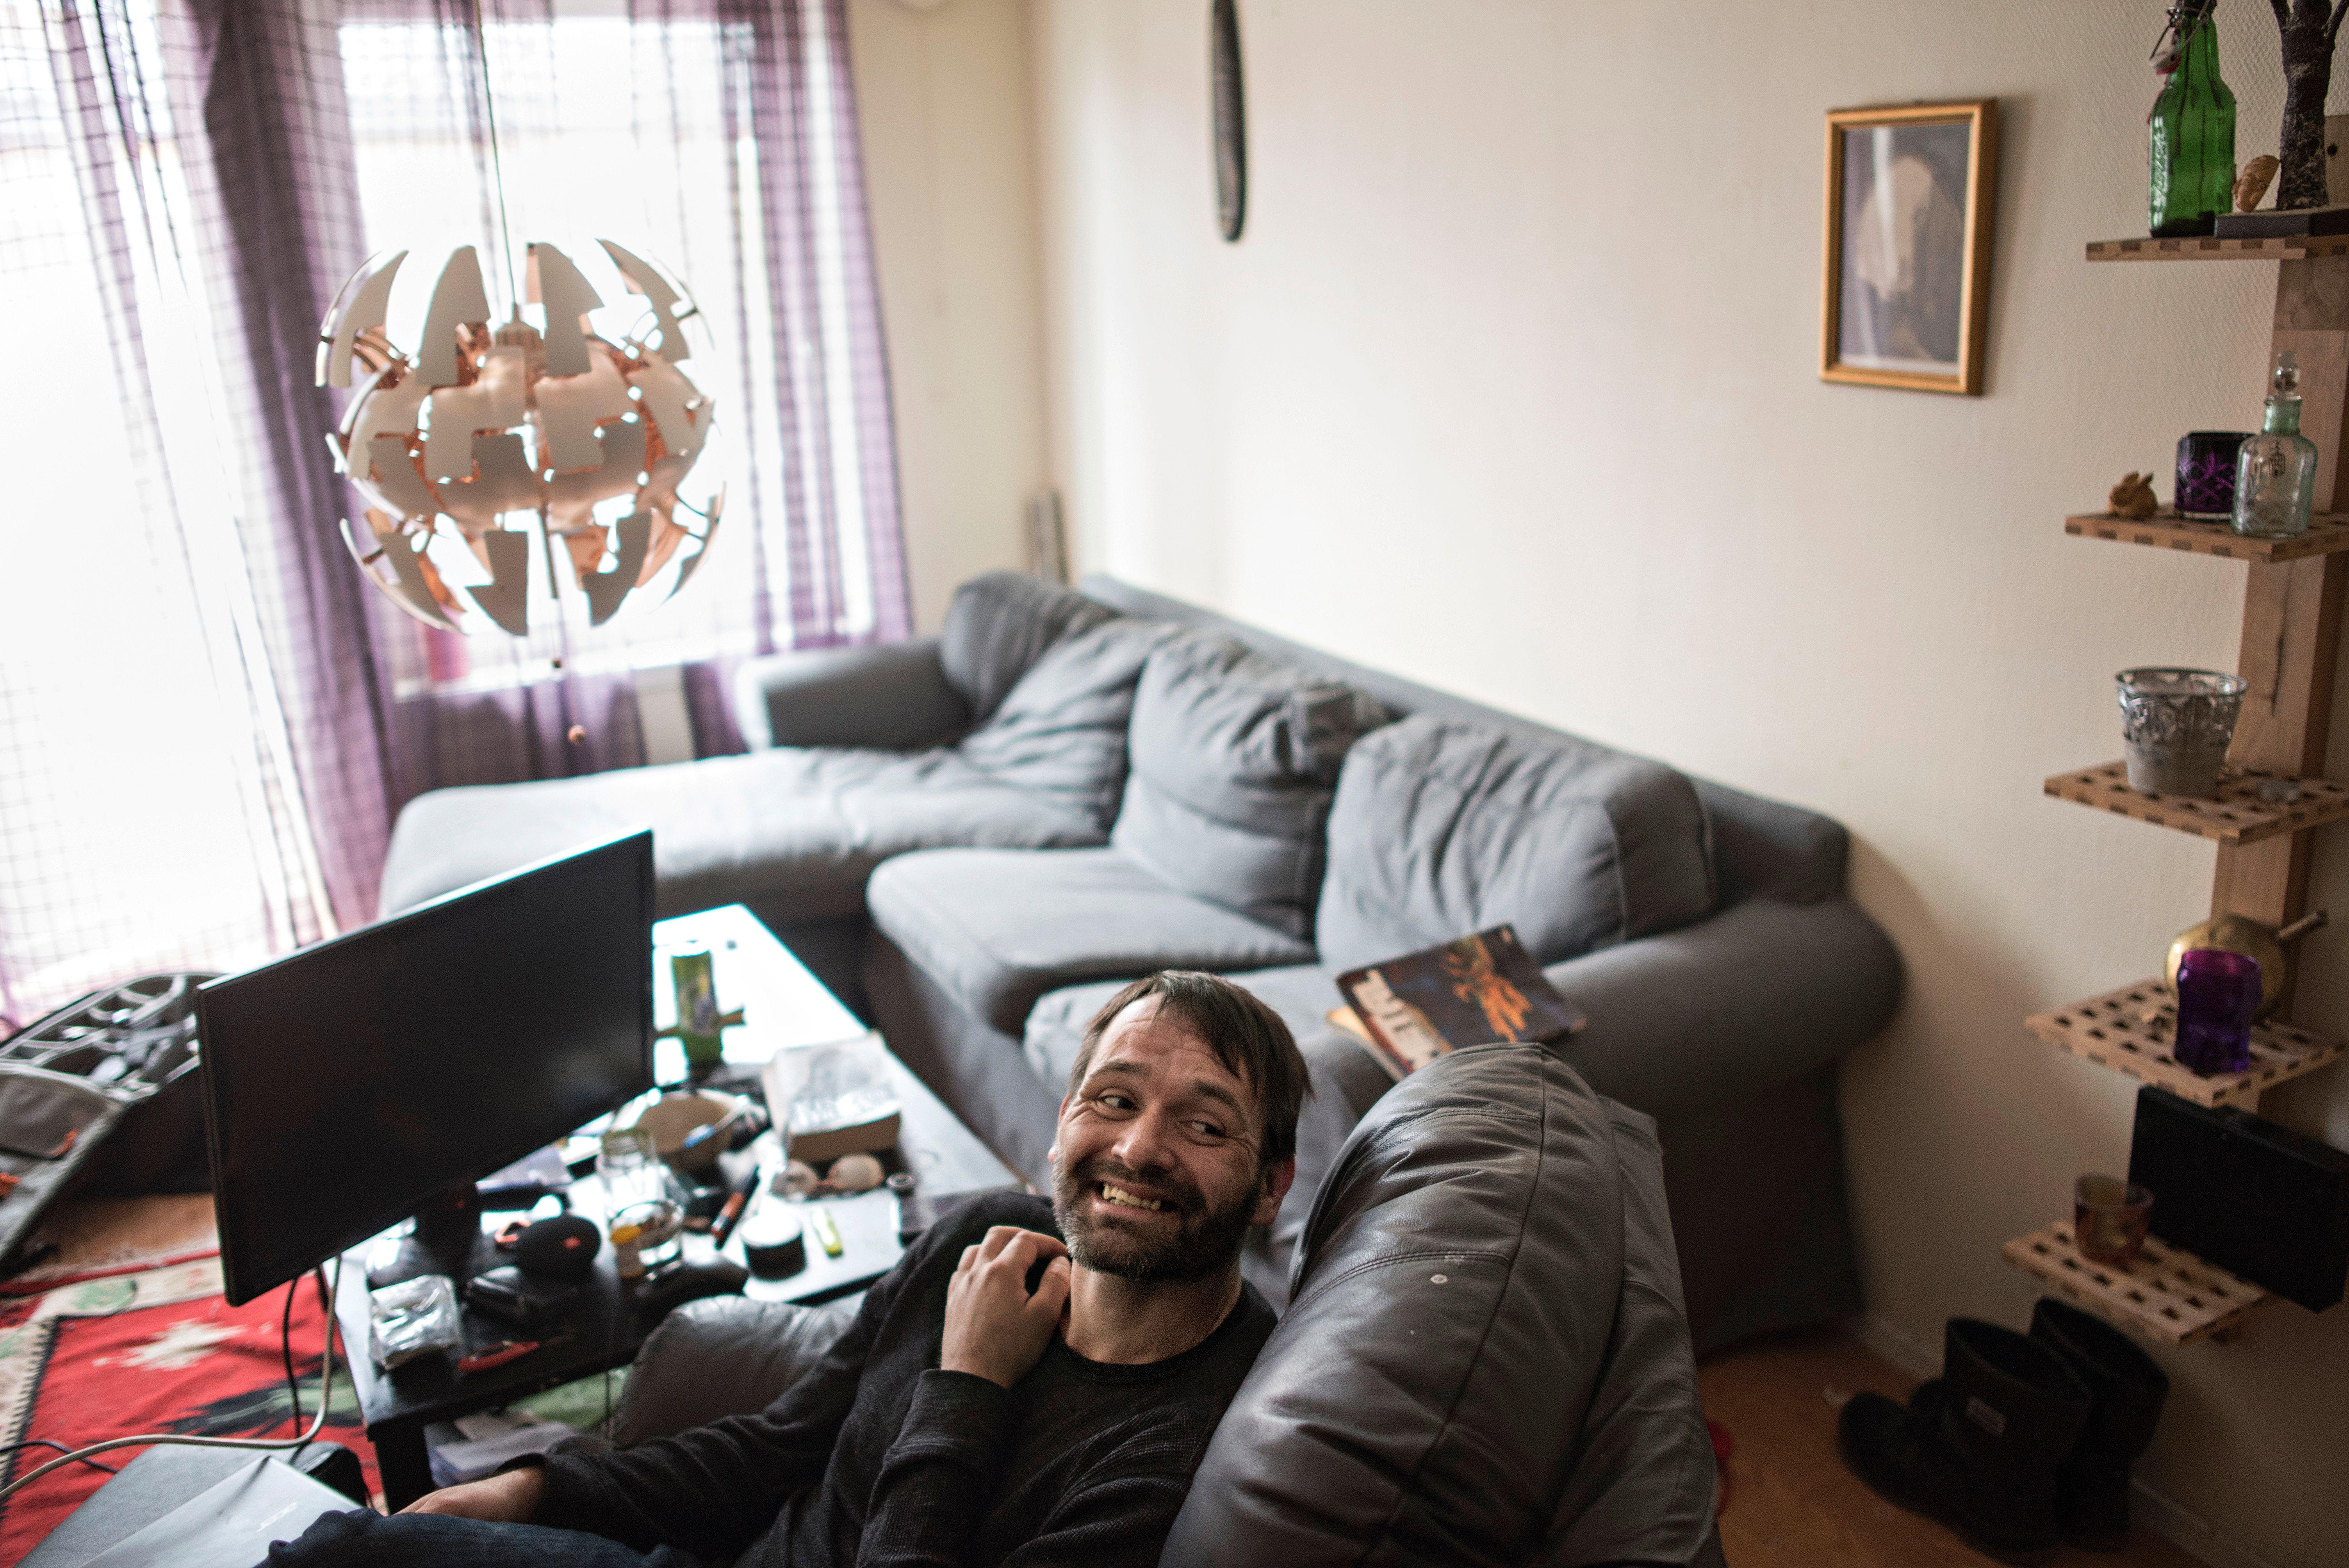 Azubi hastighet dating Duisburg 2013